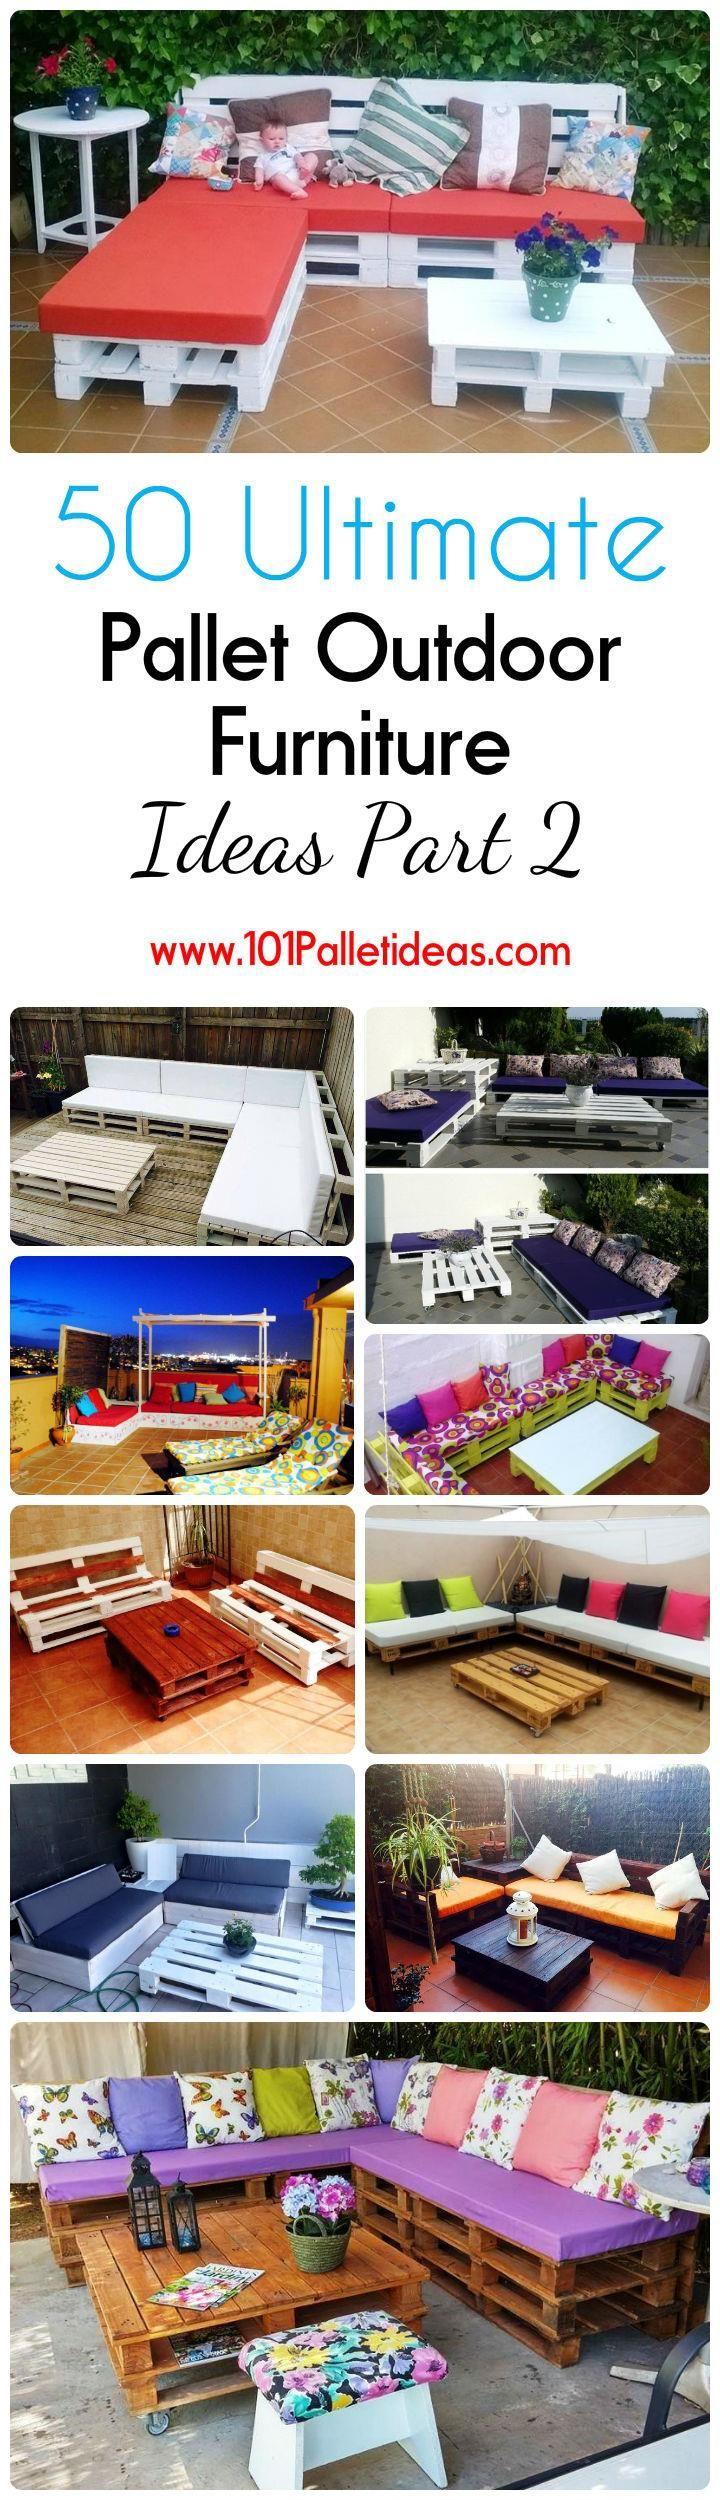 50 Ultimate Pallet Outdoor Furniture Ideas | 101 Pallet Ideas - Part 2